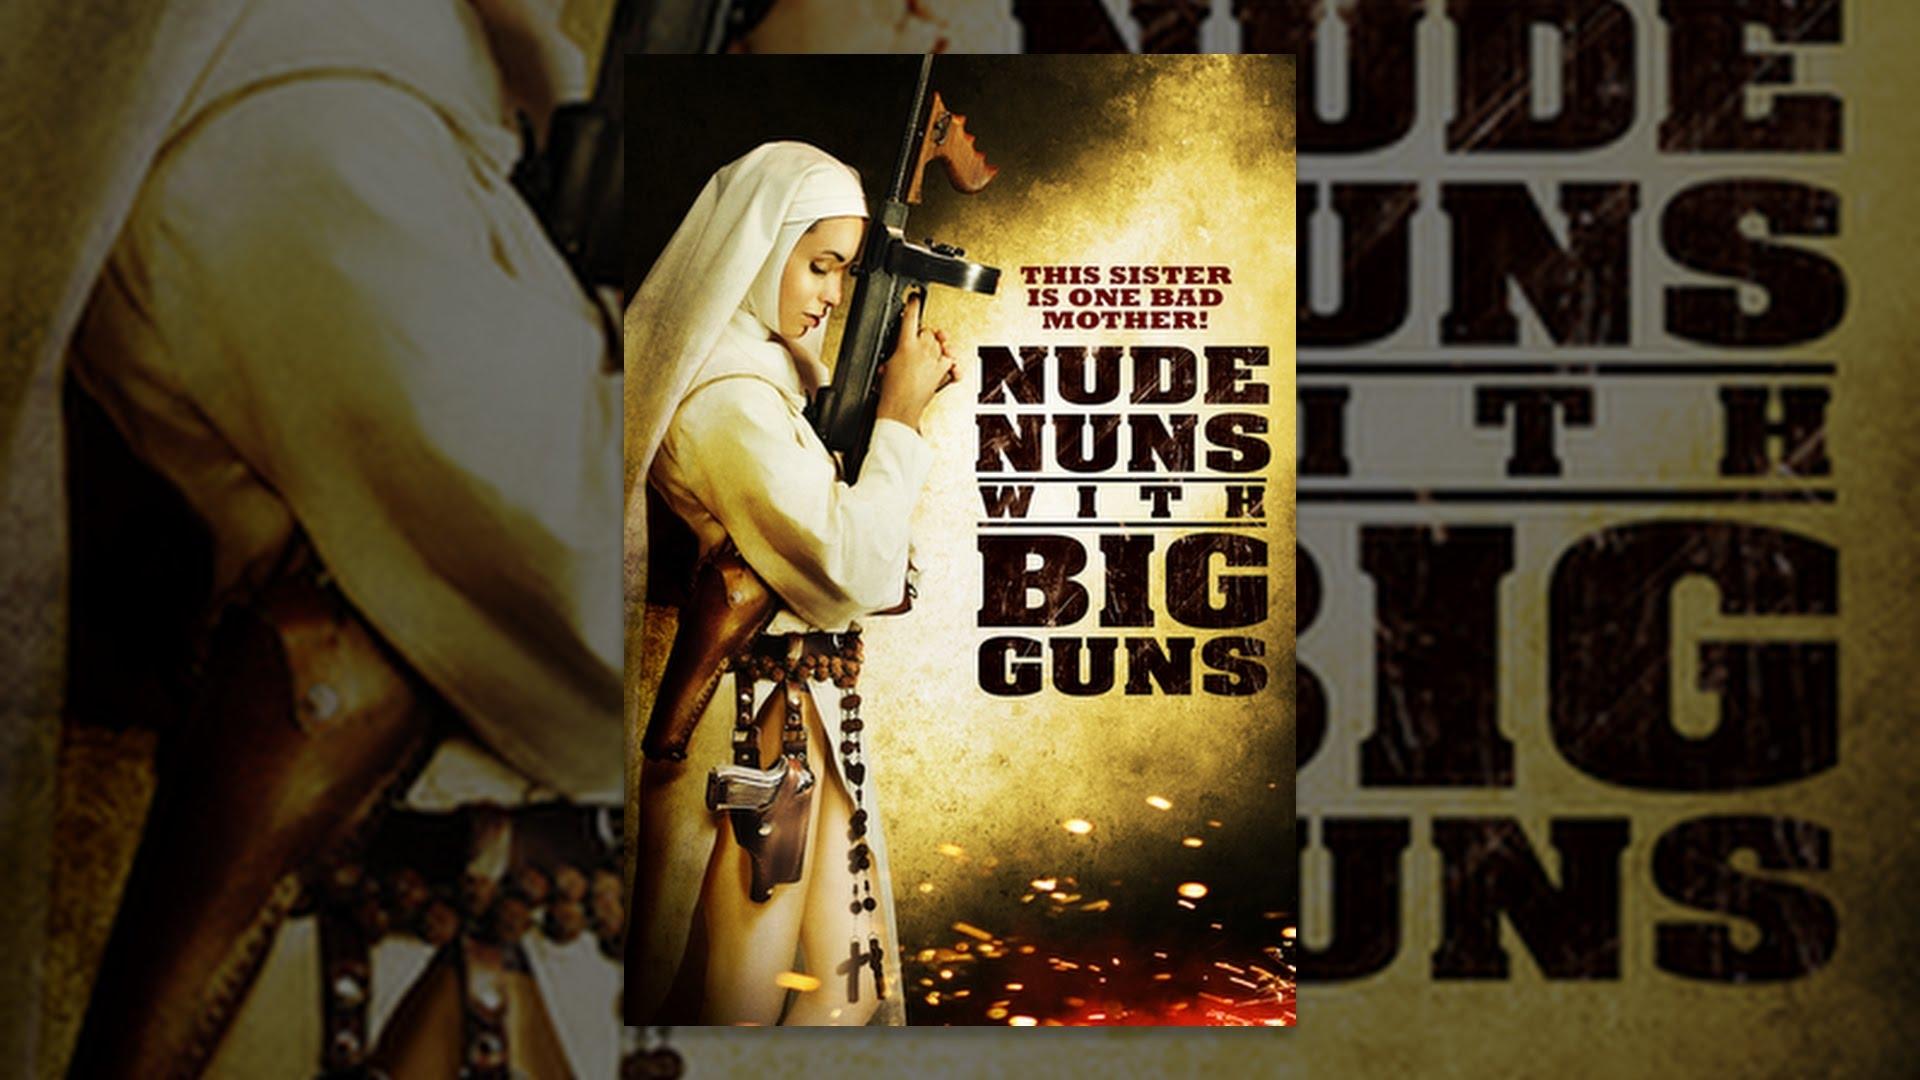 Filmsnude nuns with big guns porn photo